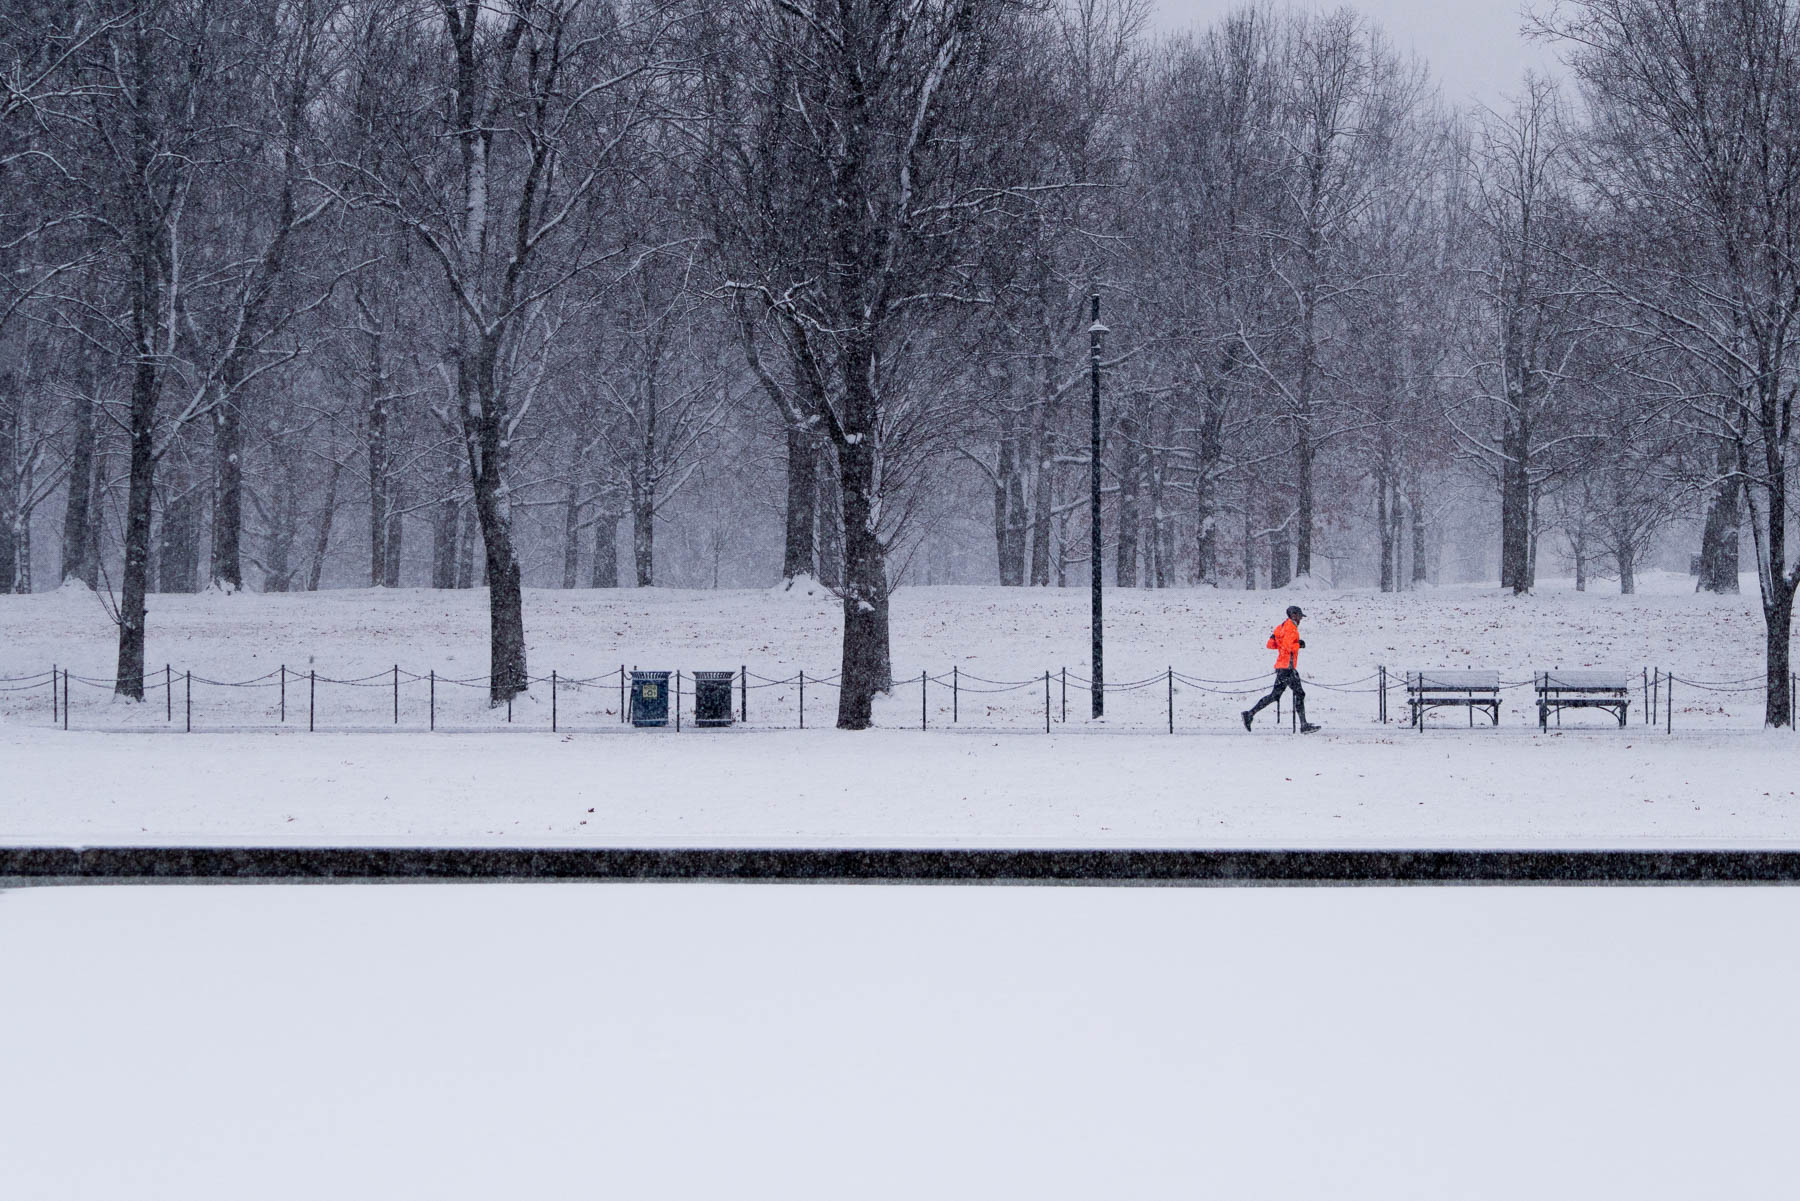 reflecting pool, washington dc, national mall, runner, snow, winter, reflection